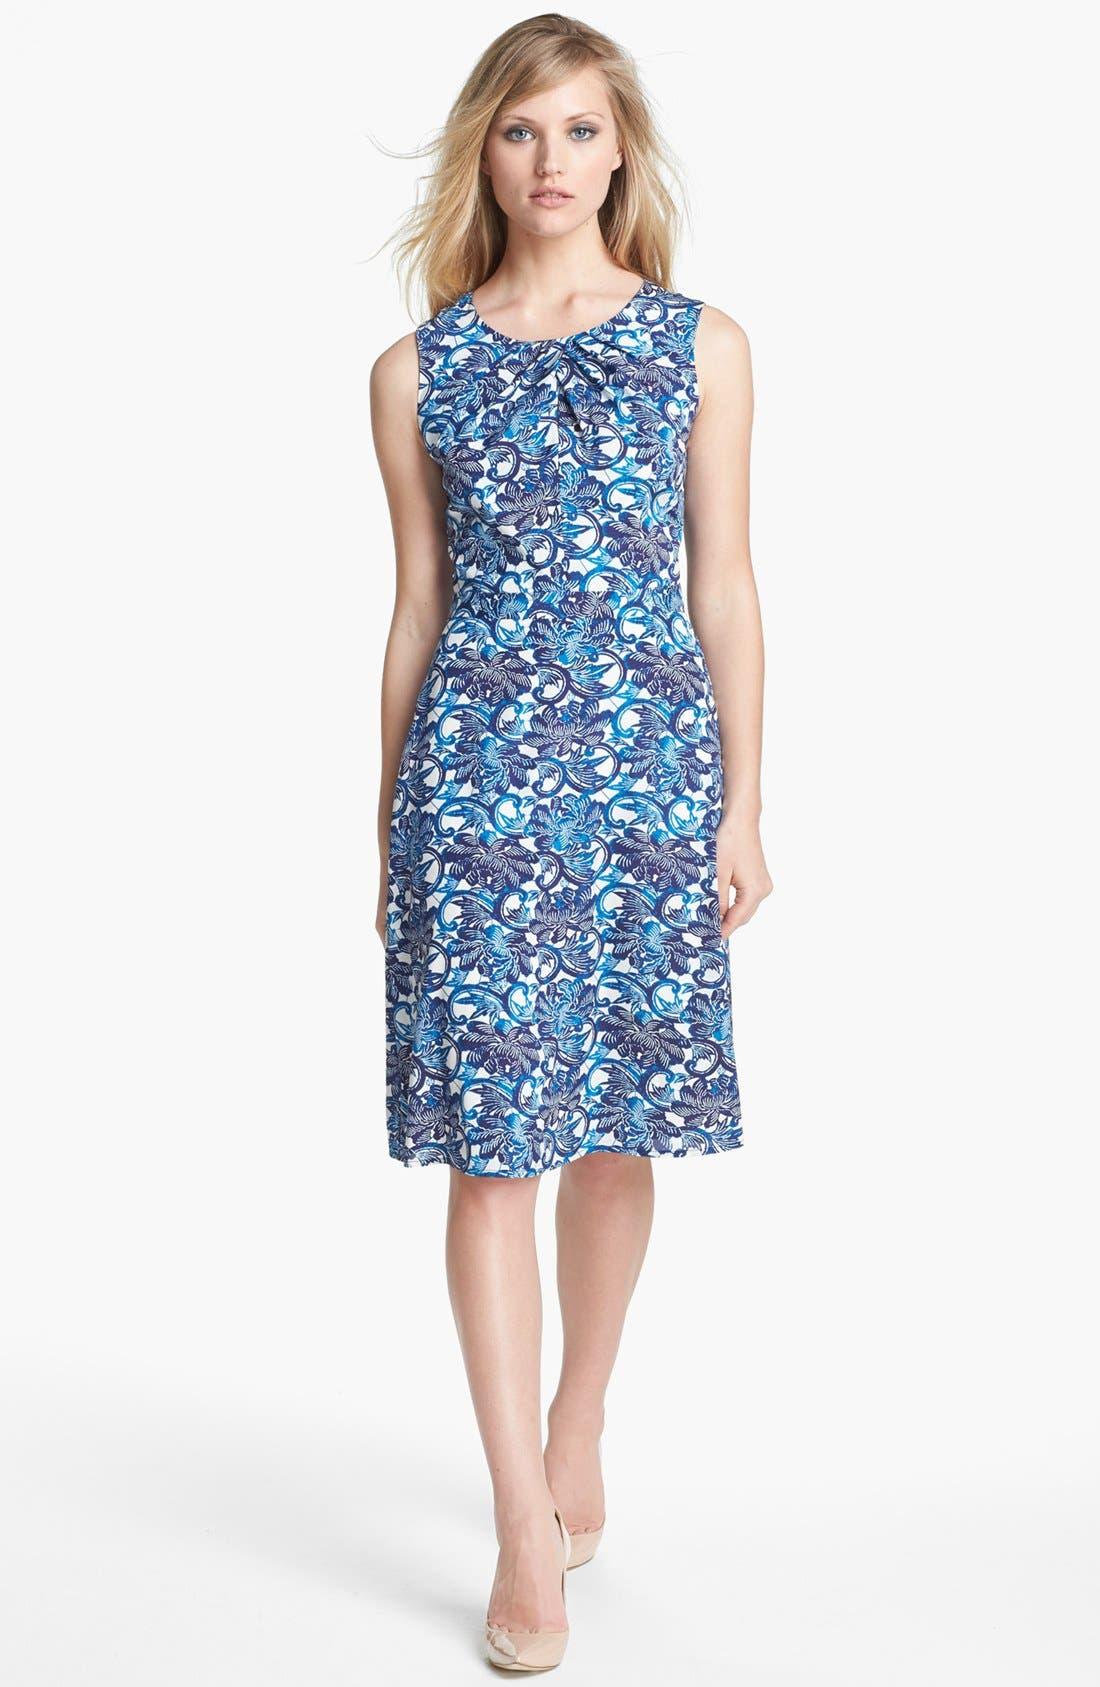 Alternate Image 1 Selected - Tory Burch 'Maxine' Stretch Silk A-Line Dress